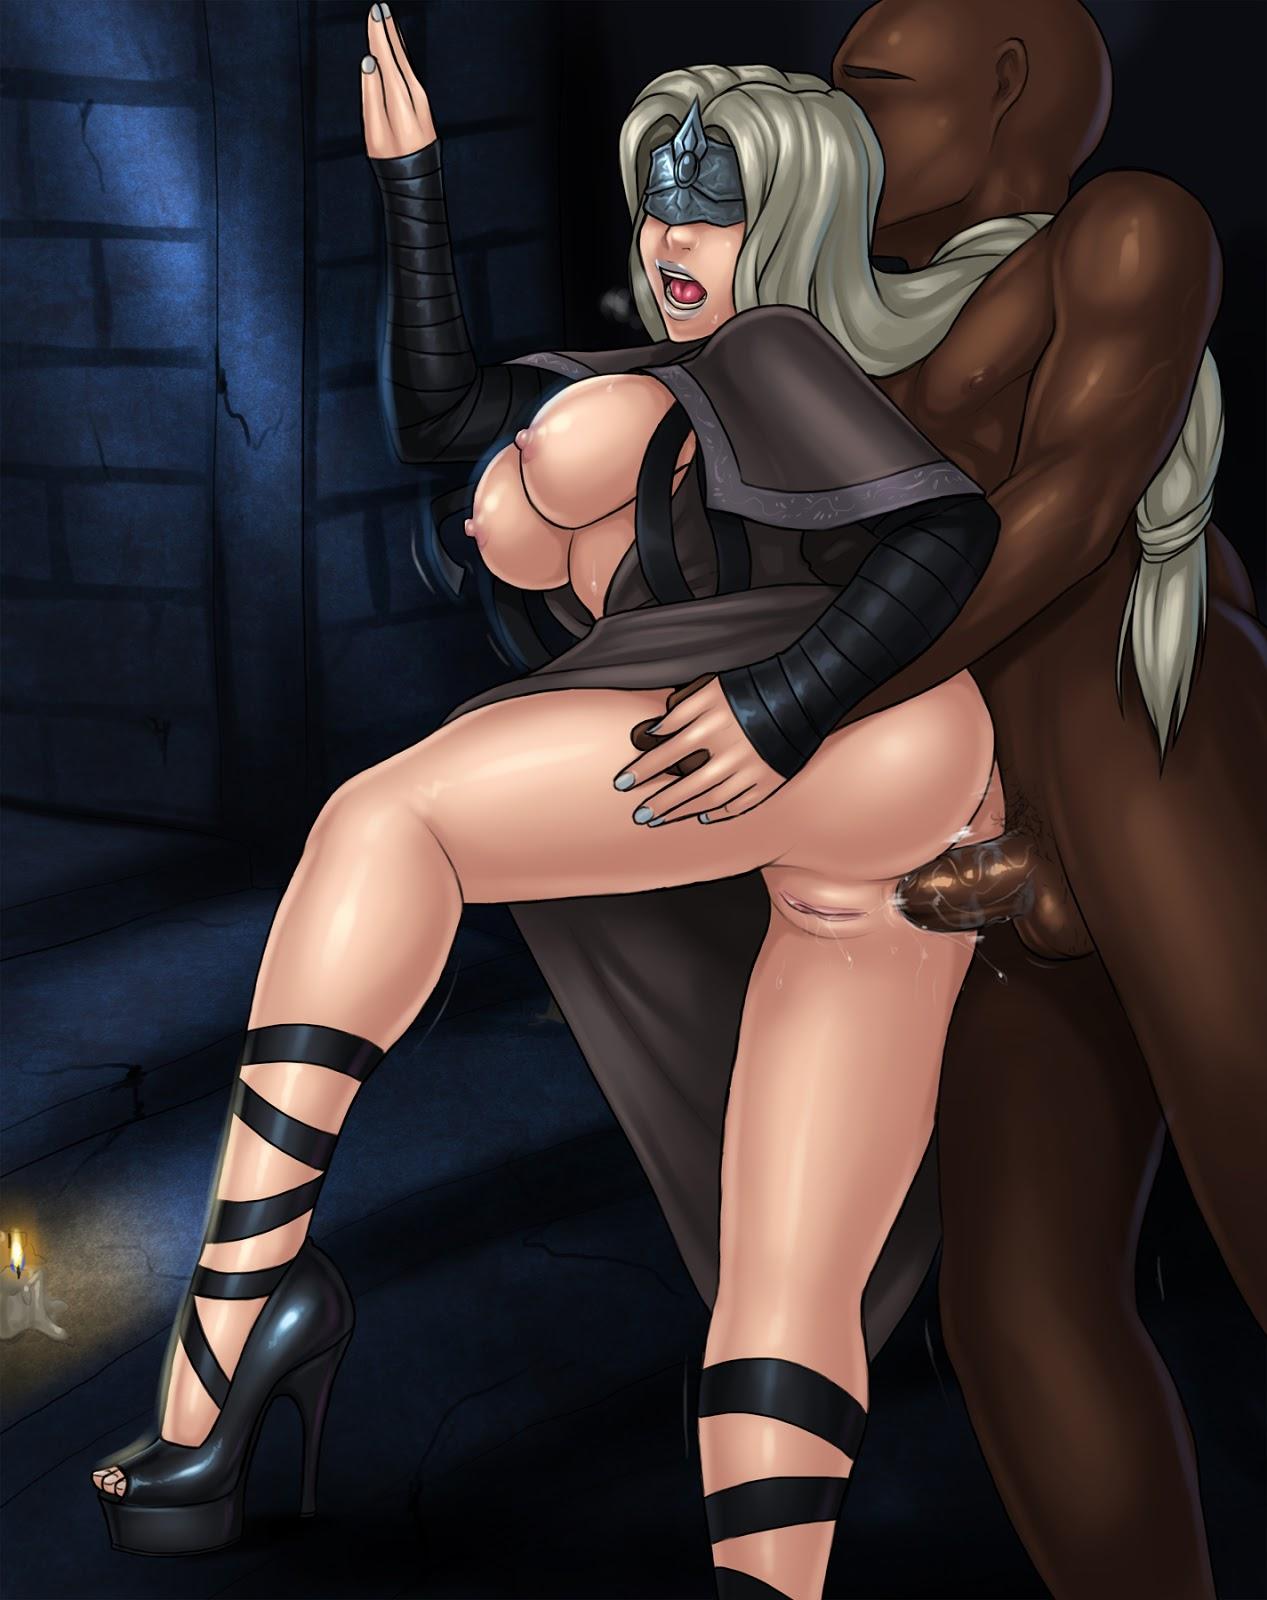 souls fire 3 maiden dark Detroit become human sfm porn